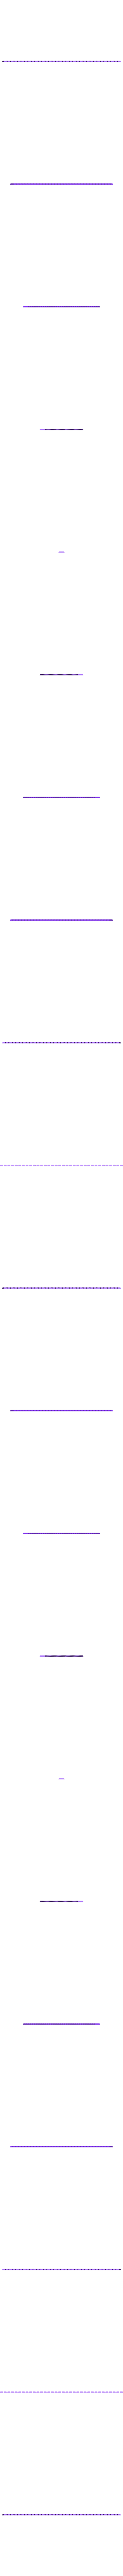 bracelet_beads.STL Download free STL file Multi-Color Bangle (Bracelet) • 3D printer template, MosaicManufacturing